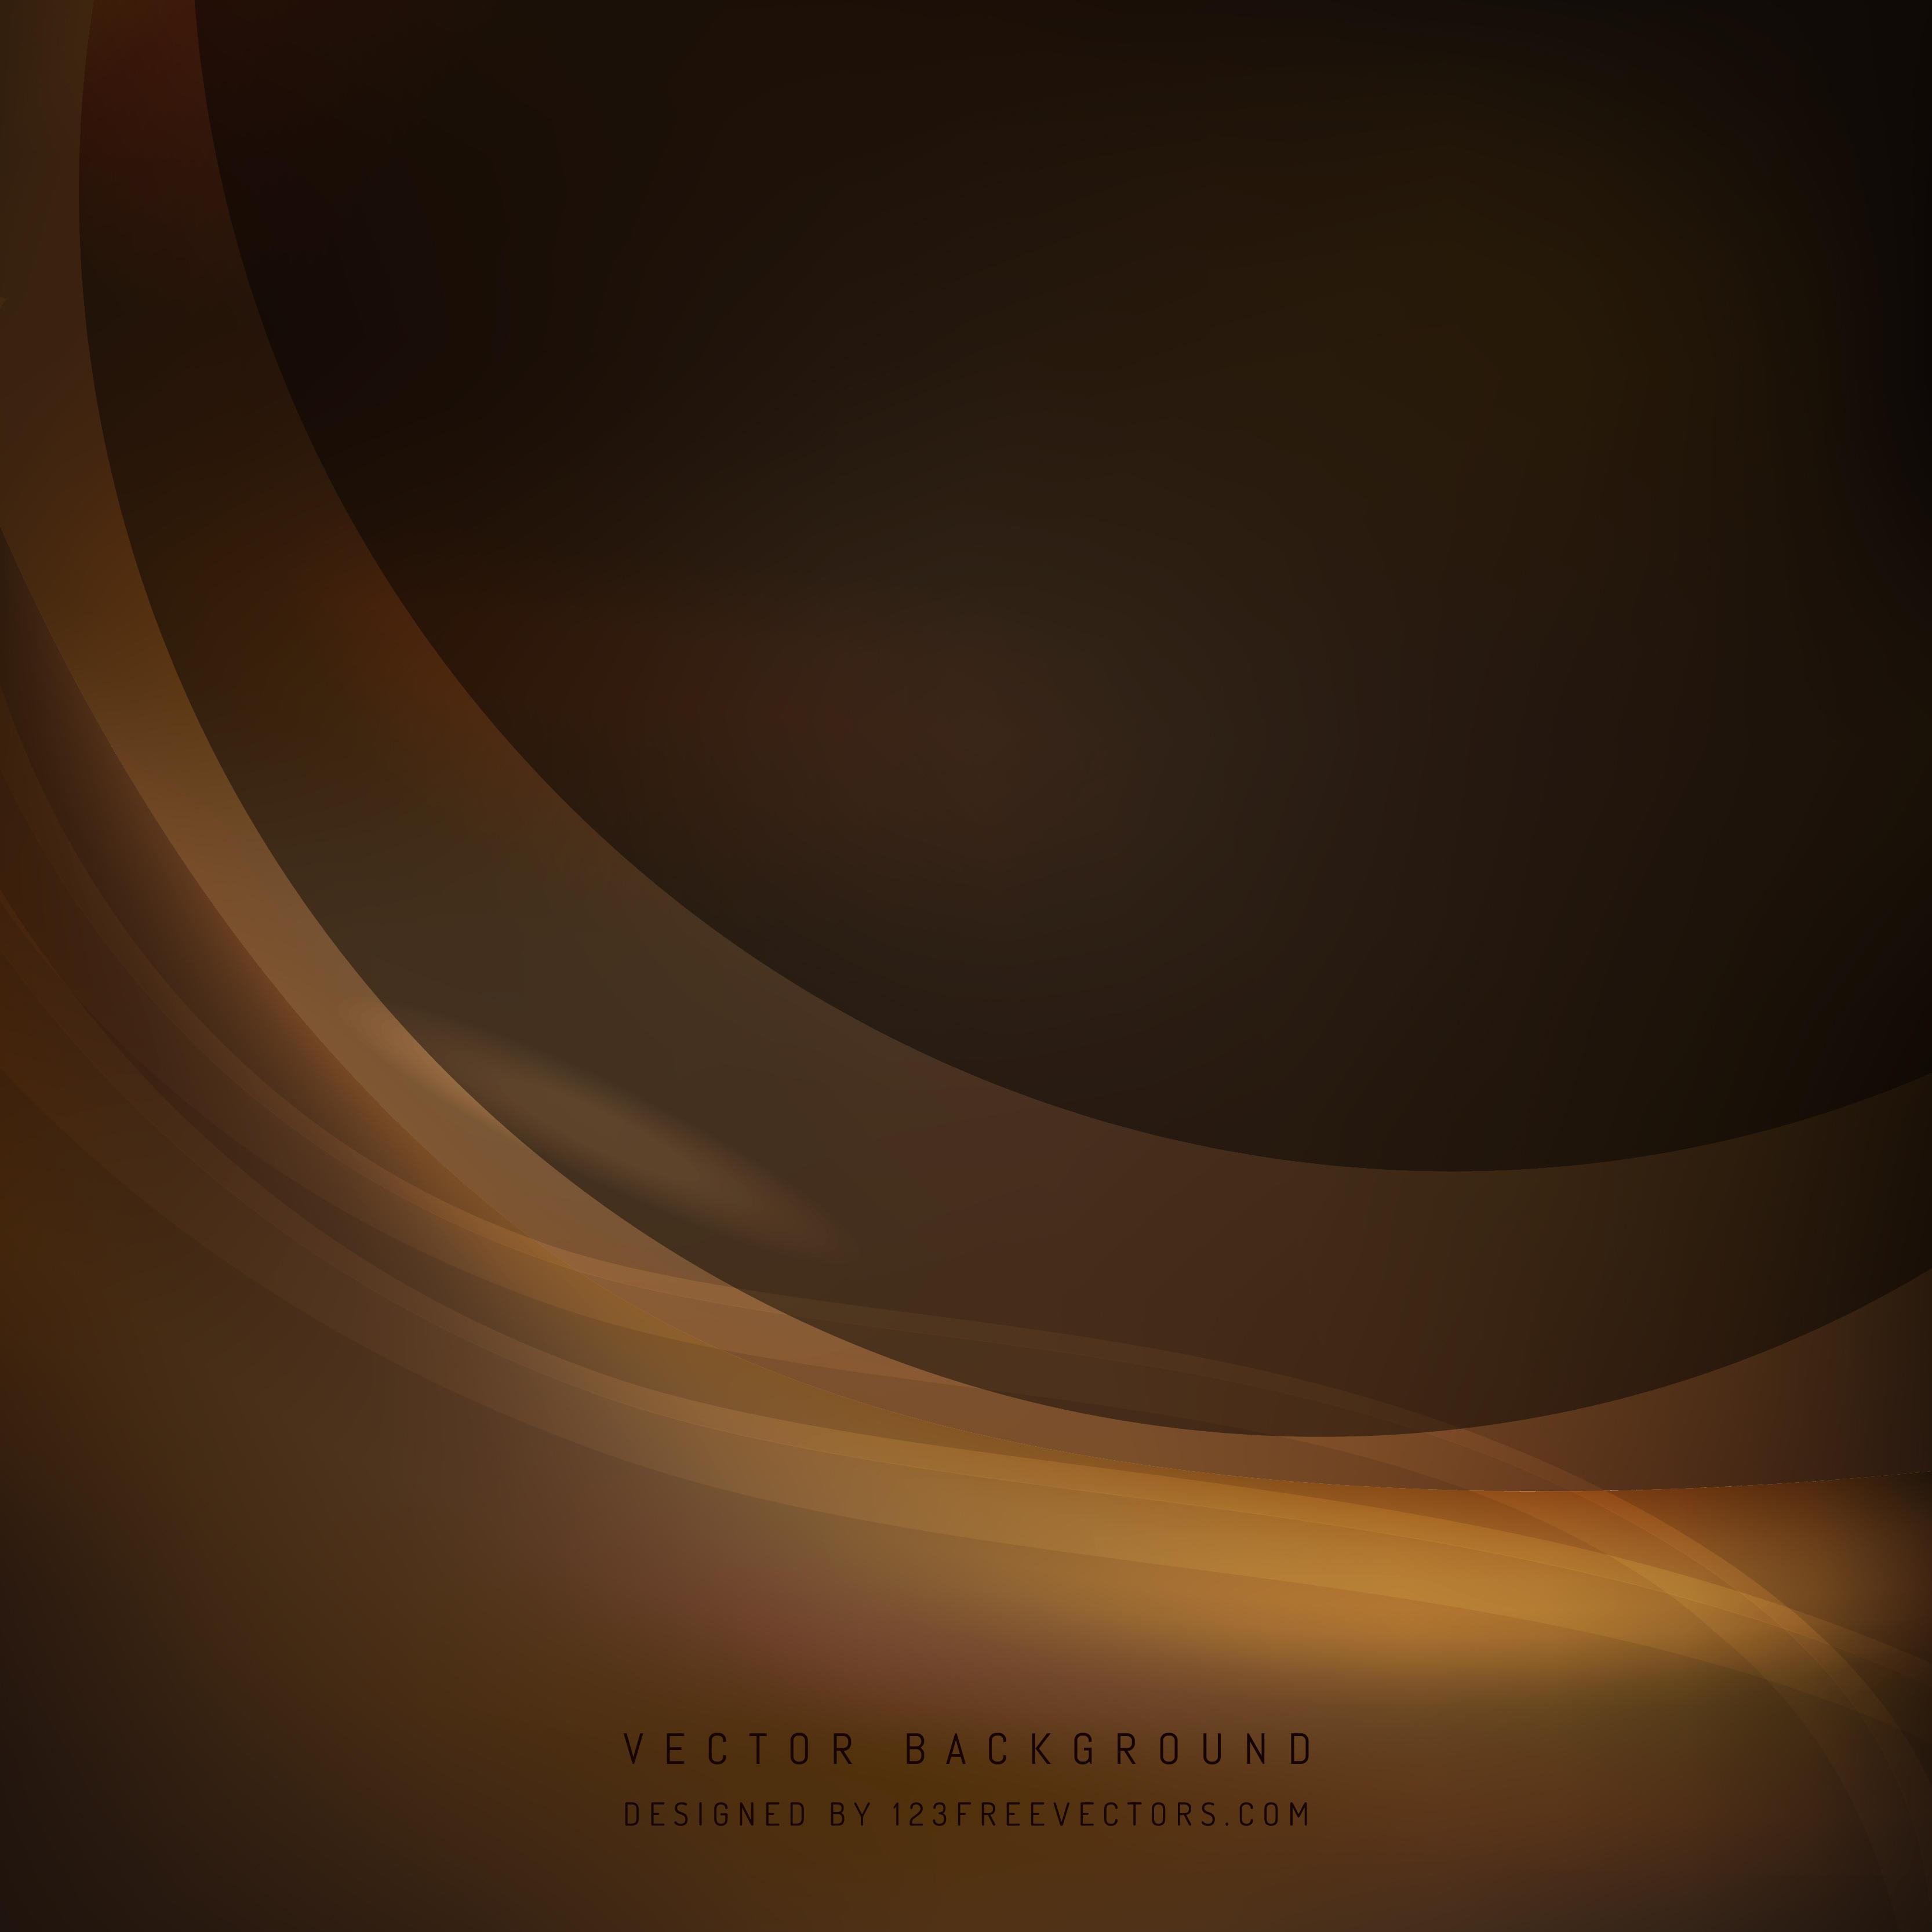 Abstract Dark Brown Wave Background